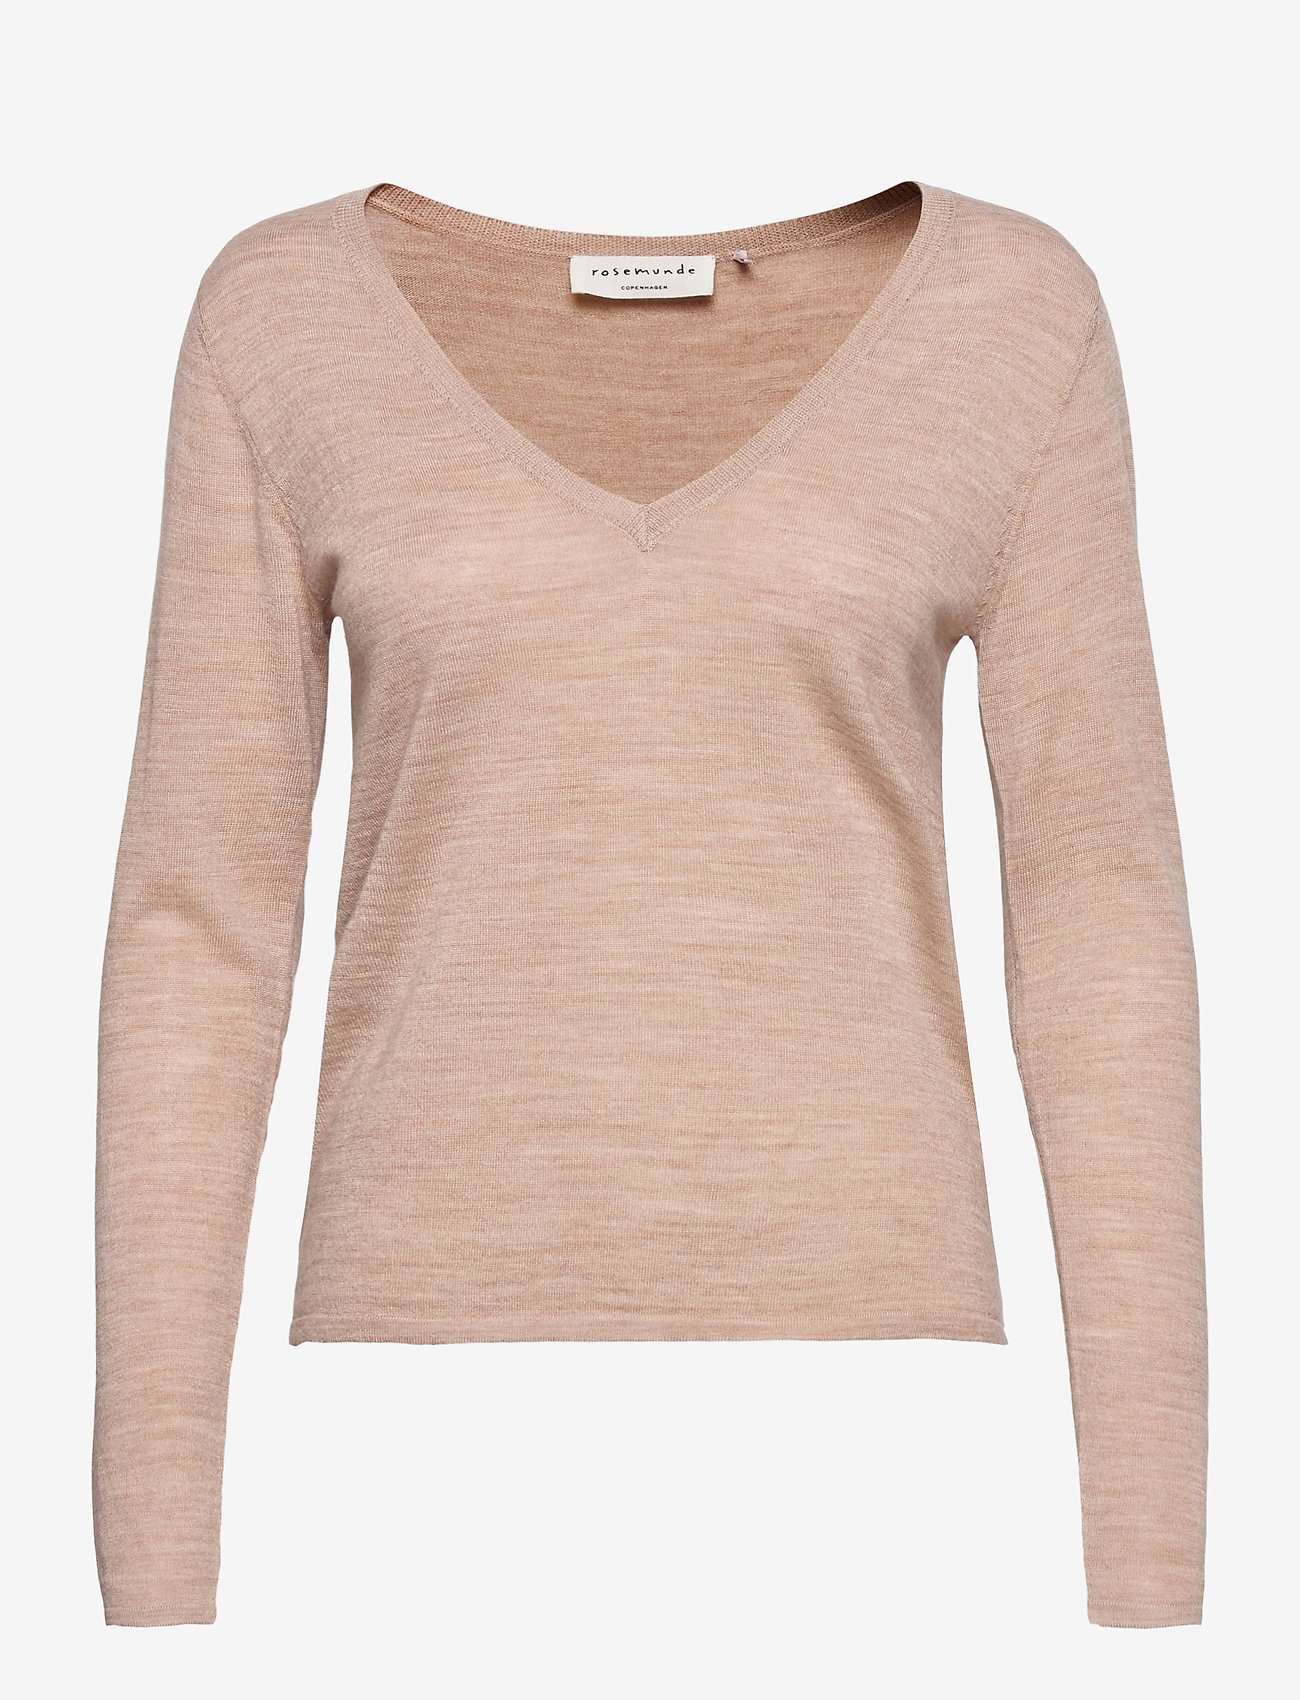 Rosemunde - Merino pullover ls - tröjor - beige melange - 0